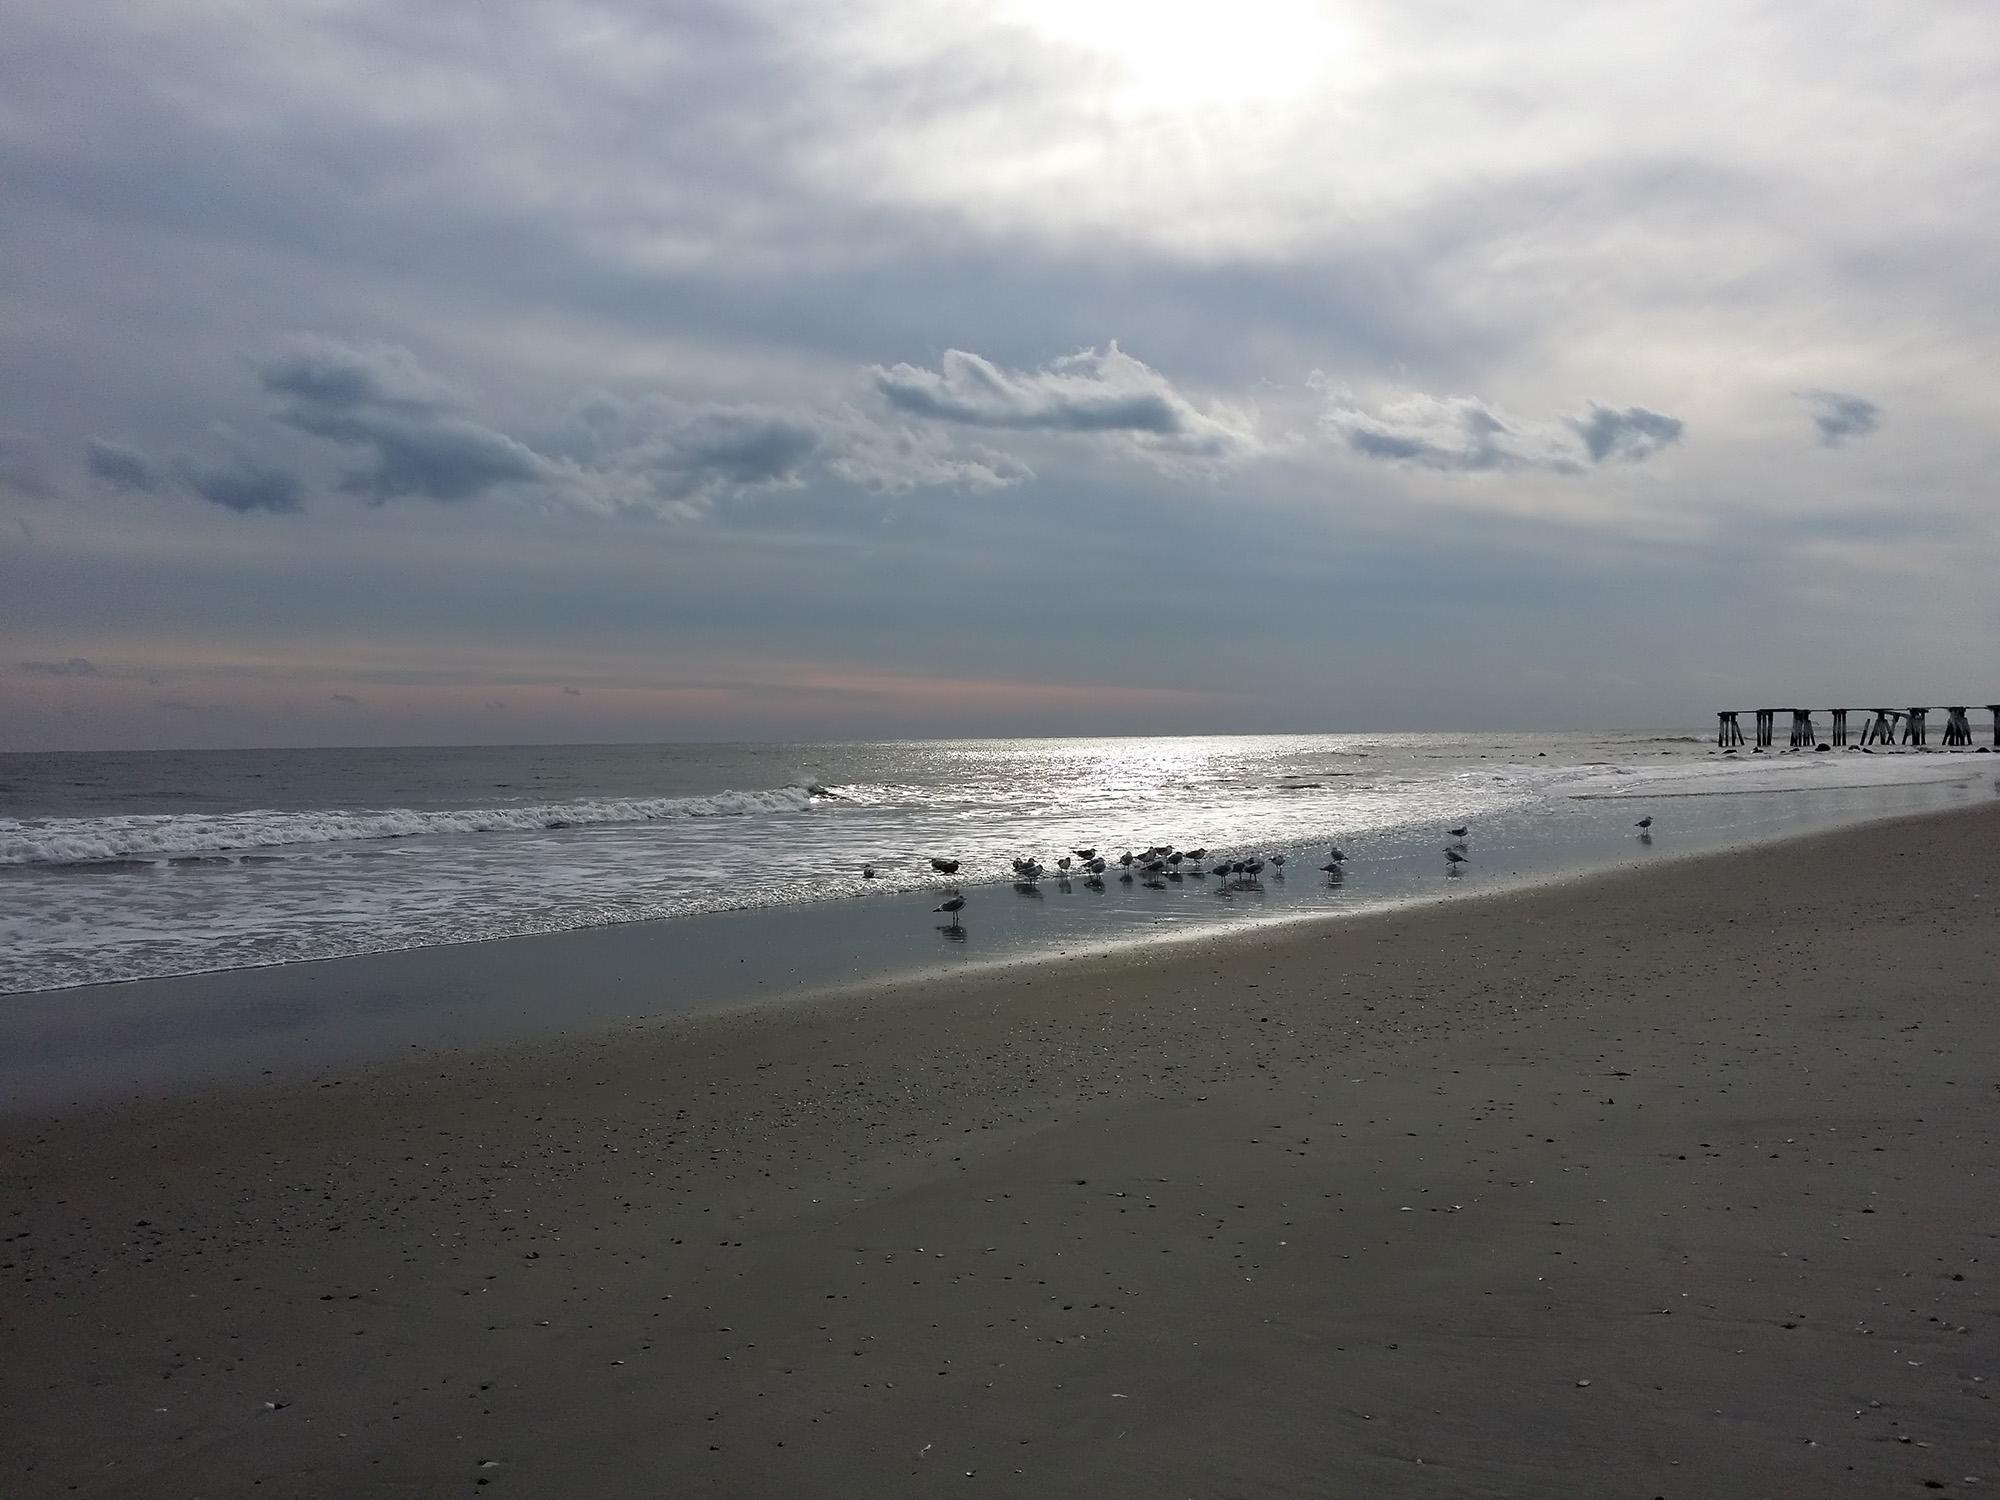 The Beach at Atlantic CIty